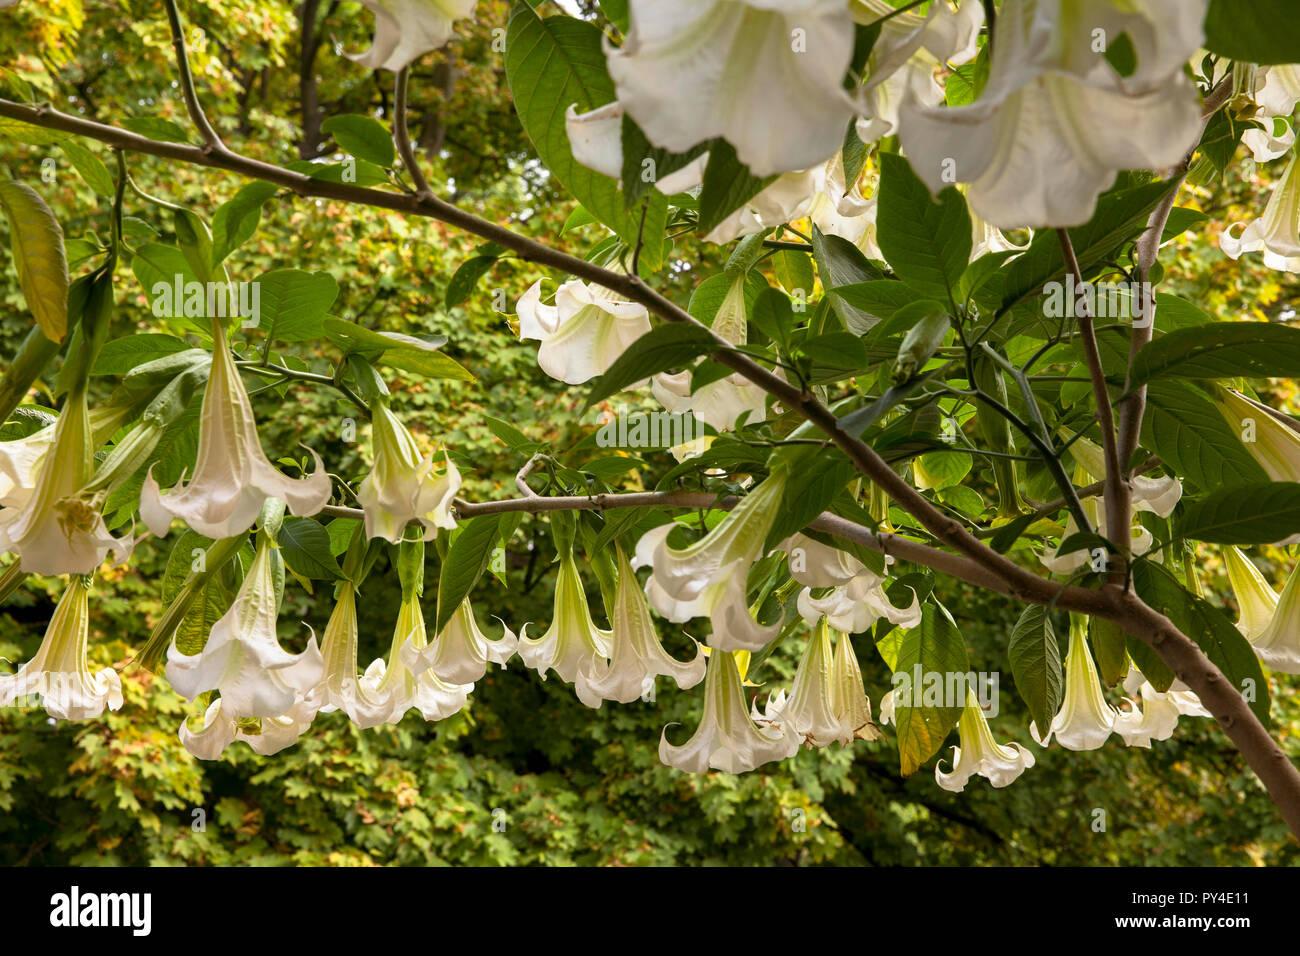 flourishing Angel Trumpet (lat. Brugmansia).  bluehende Engelstrompete (lat. Brugmansia). - Stock Image